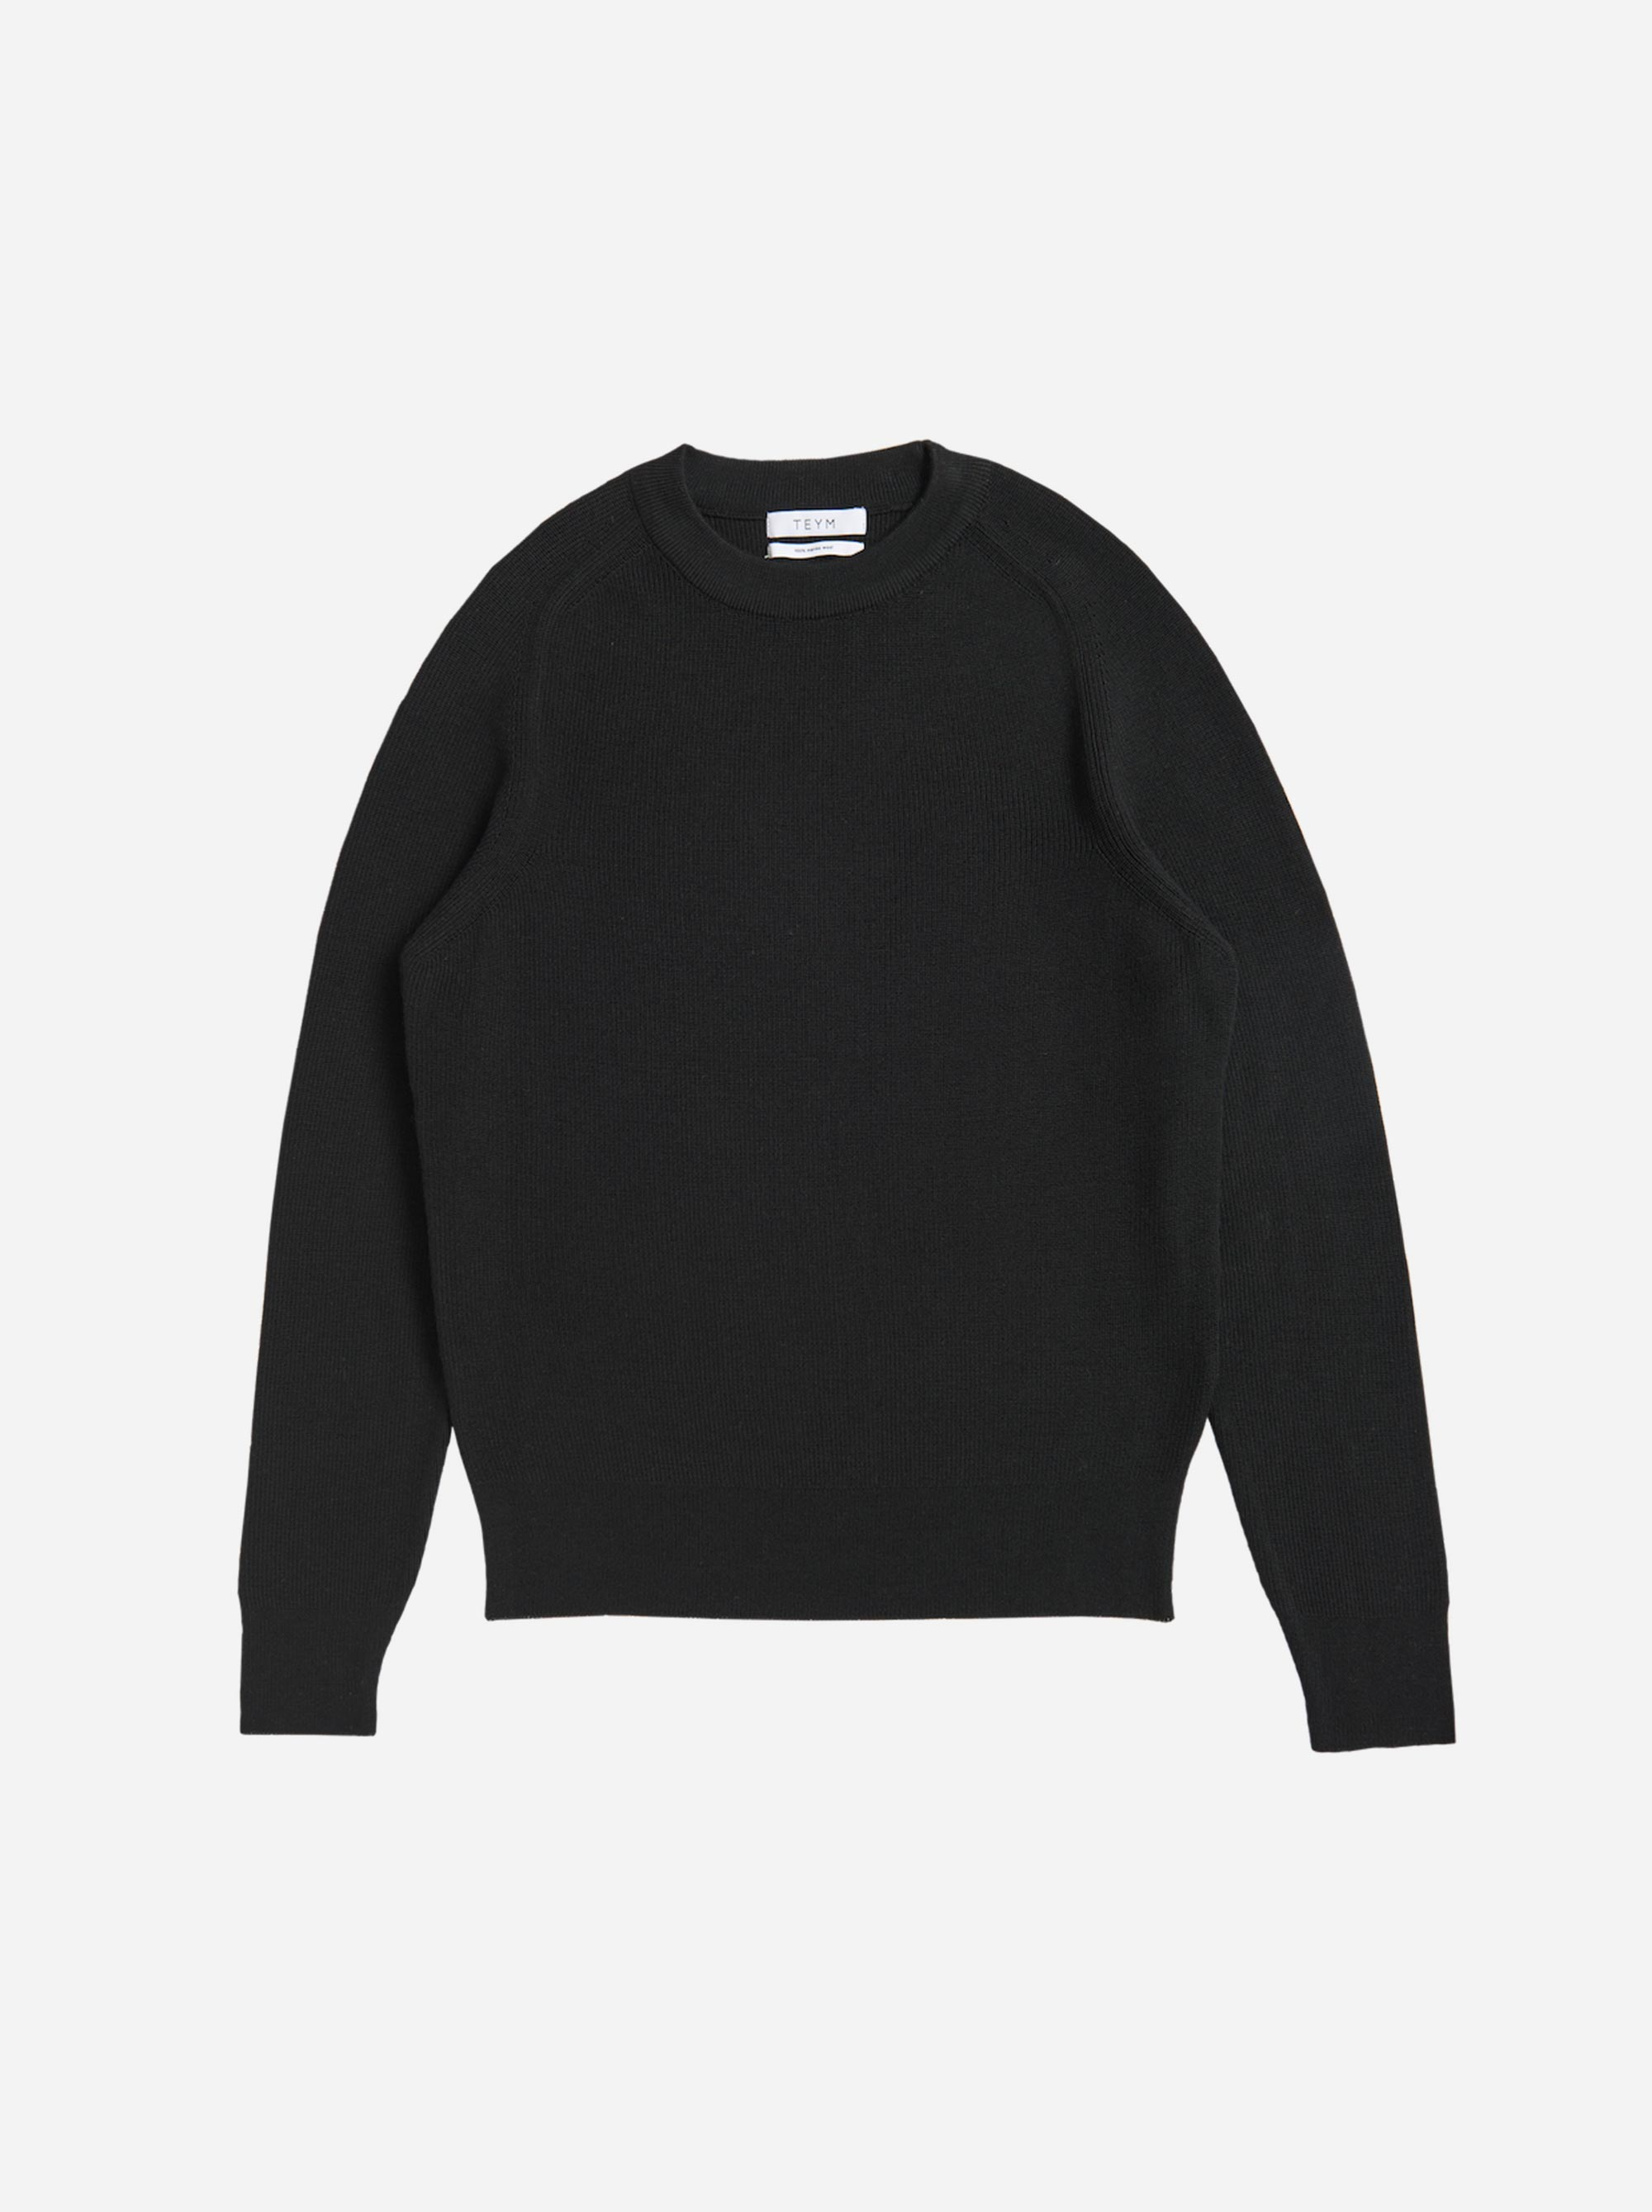 Teym - Crewneck - The Merino Sweater - Women - Black - 4